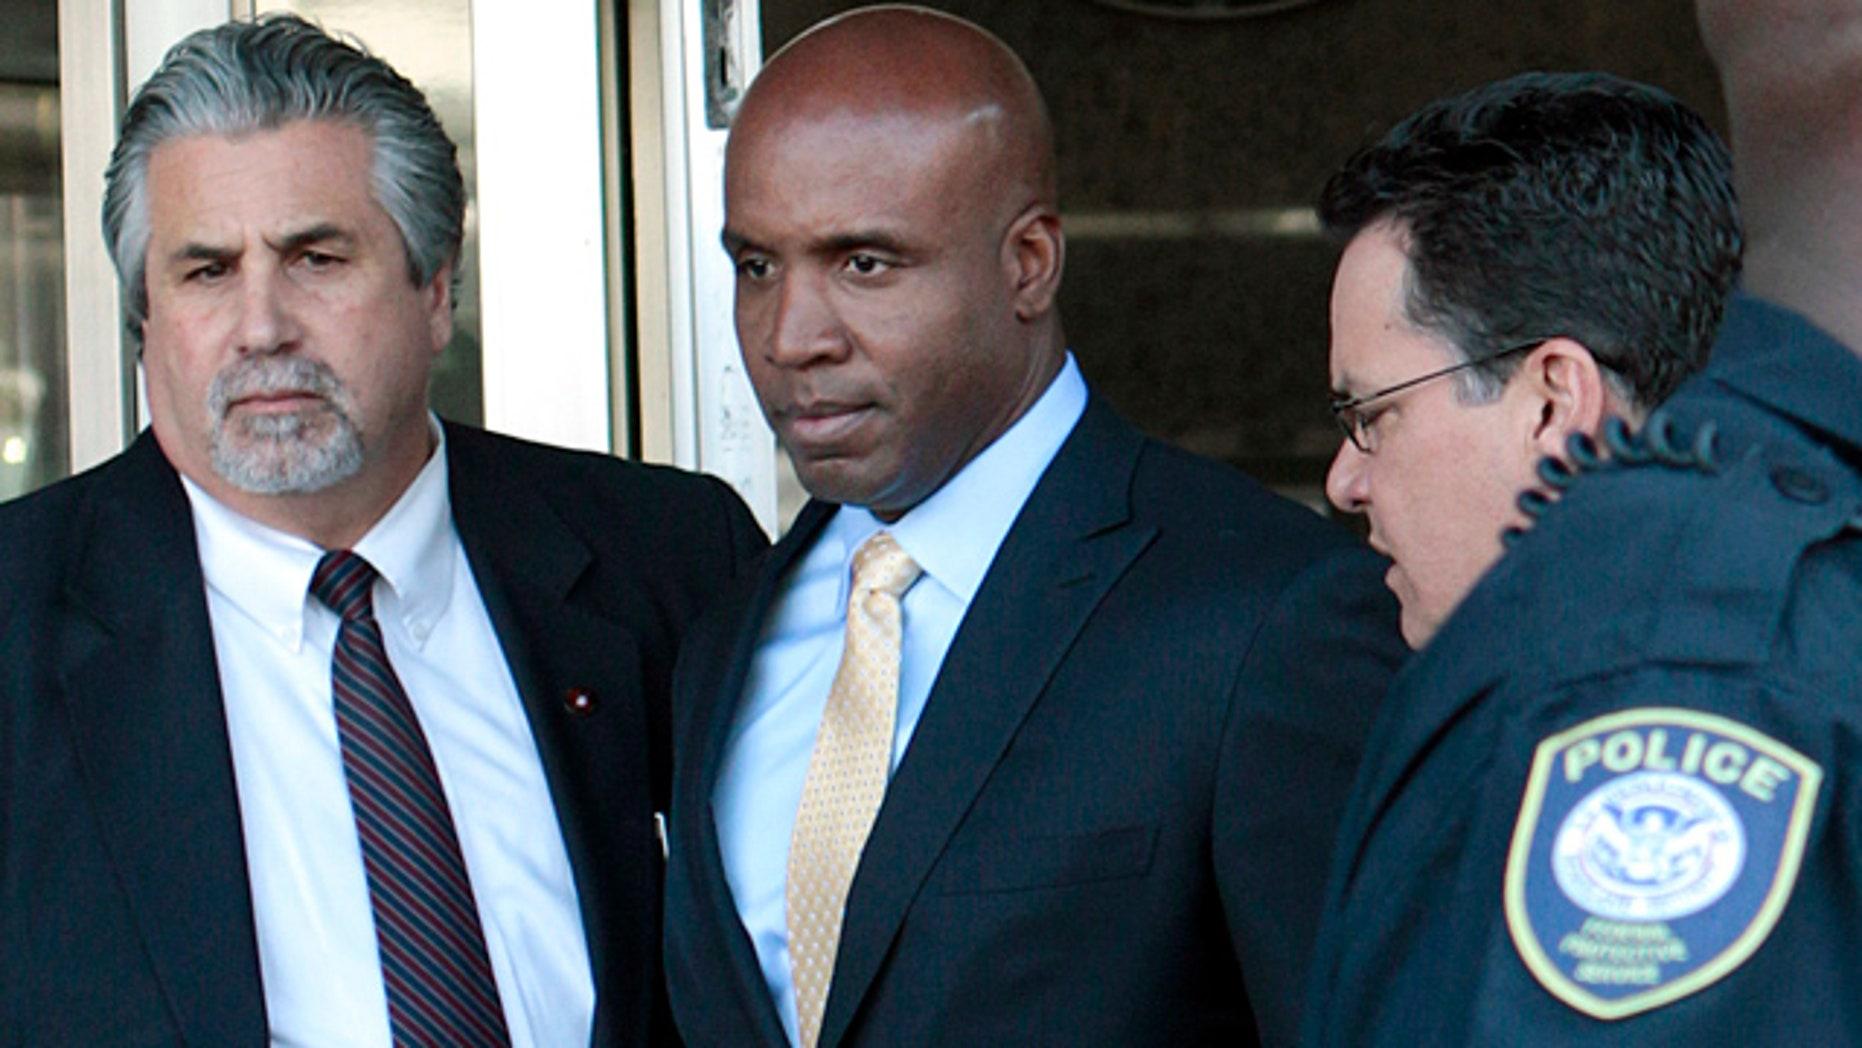 April 7: Former baseball player Barry Bonds, center, leaves federal court in San Francisco.